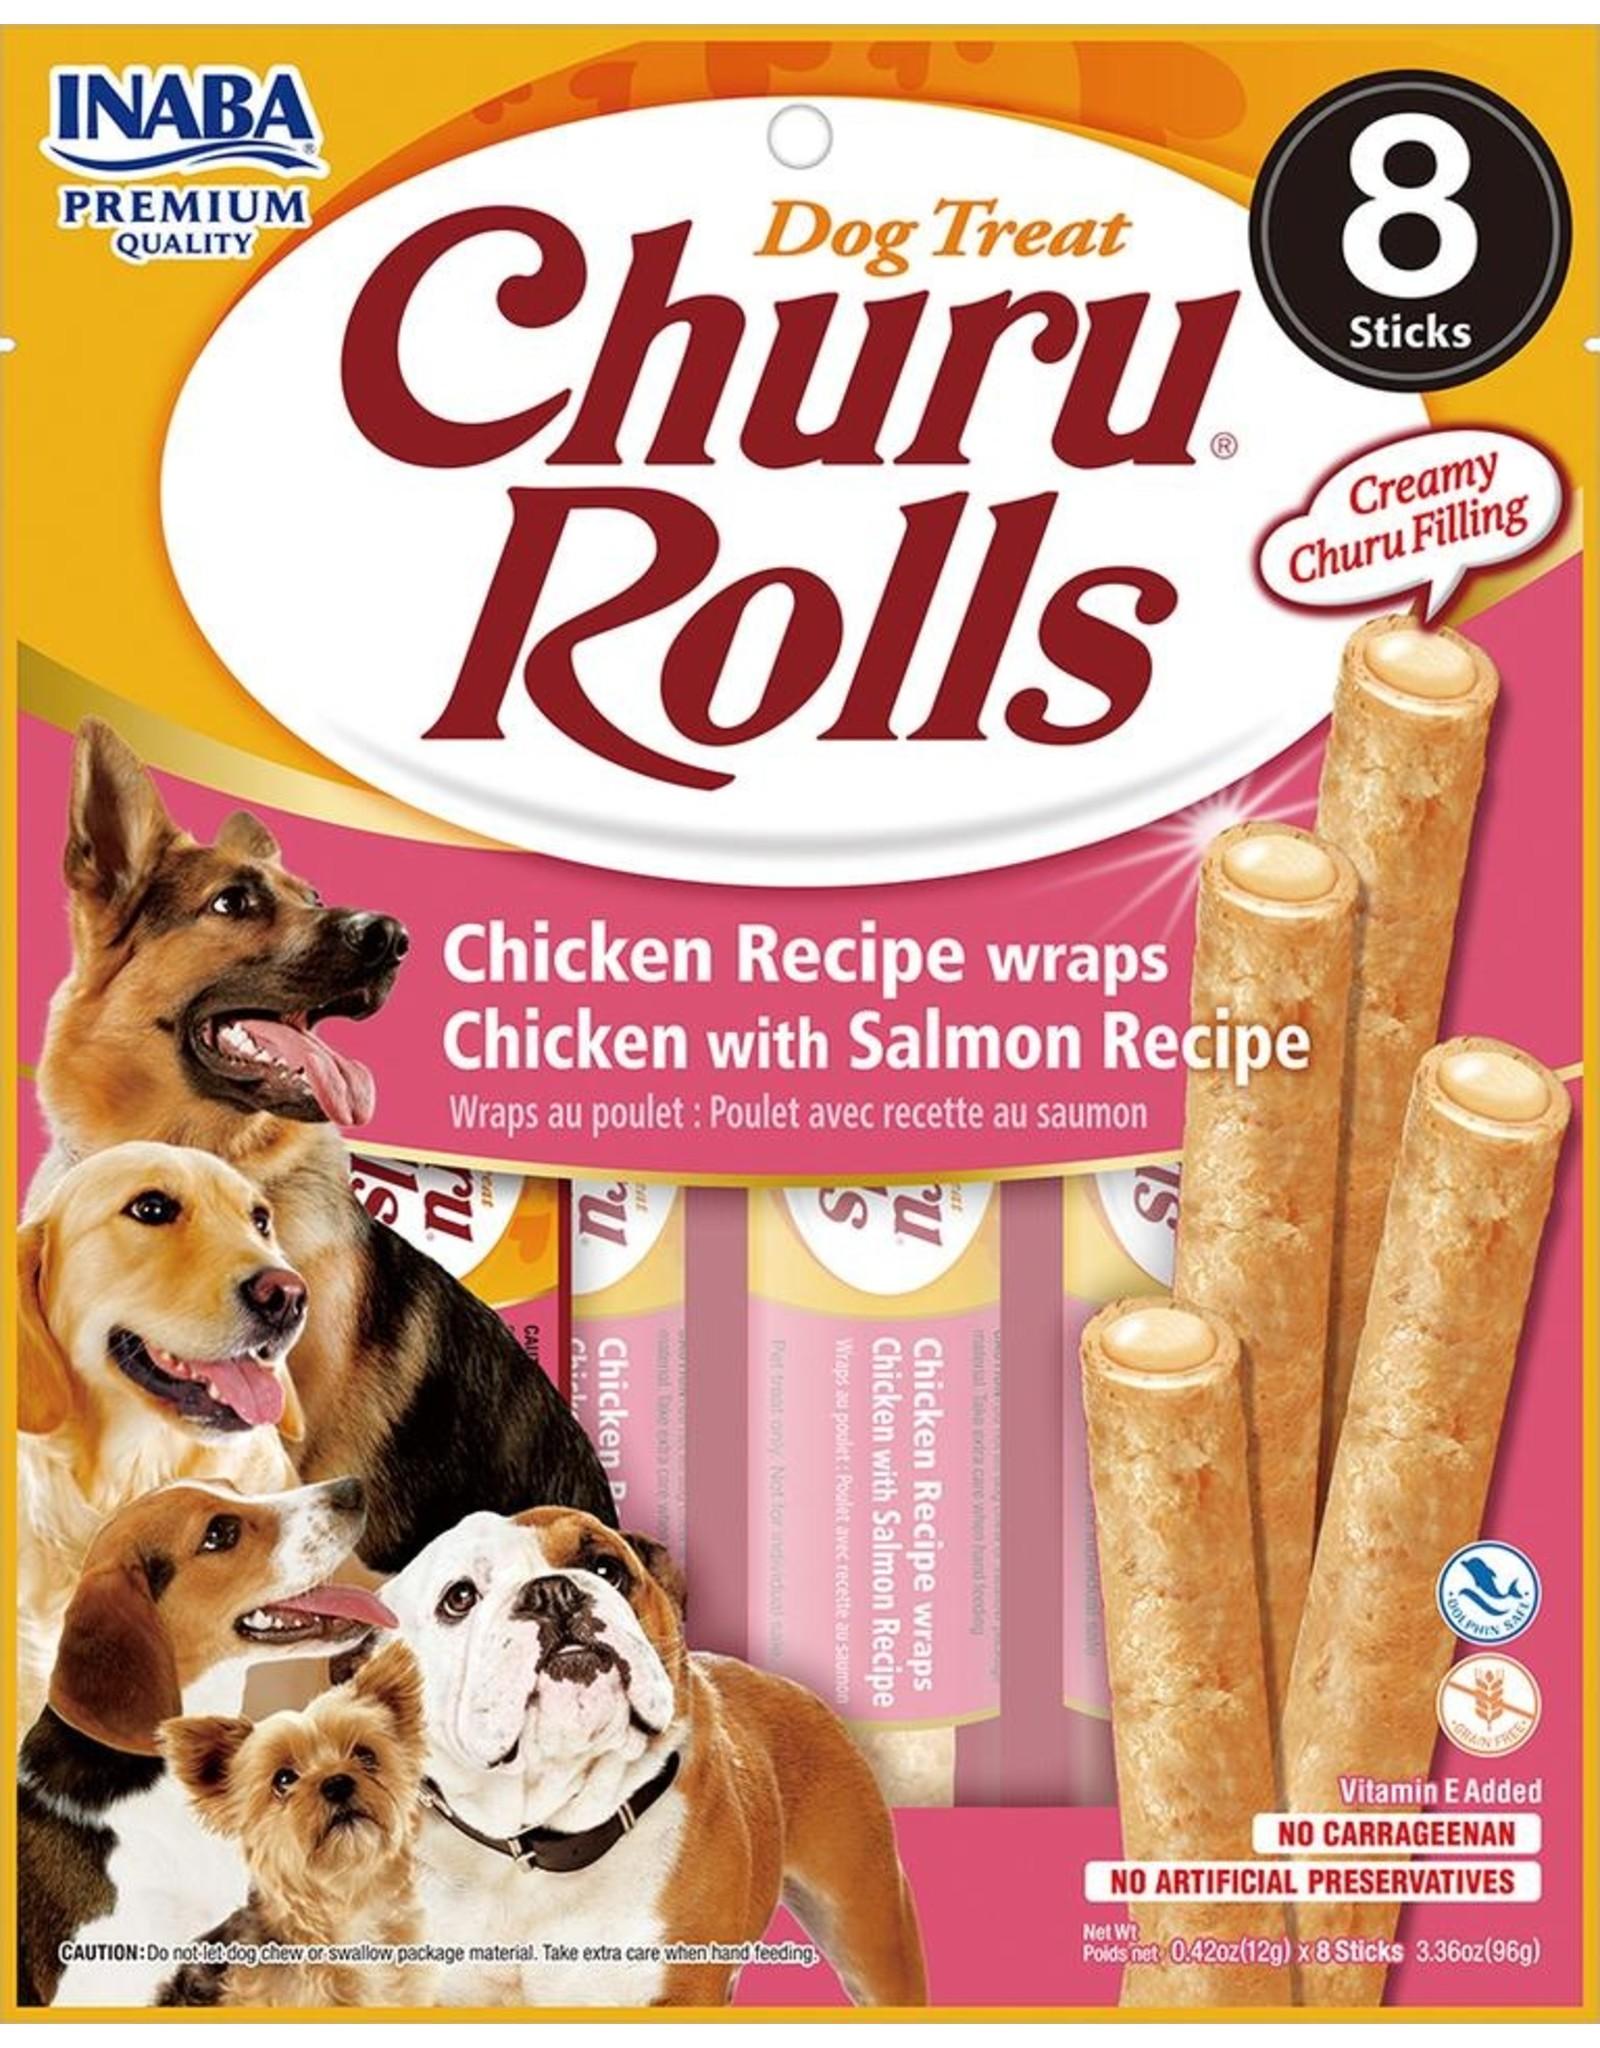 Inaba INABA DOG CHURU ROLLS CHICKEN RECIPE WRAPS CHICKEN WITH CHEESE RECIPE 8-COUNT